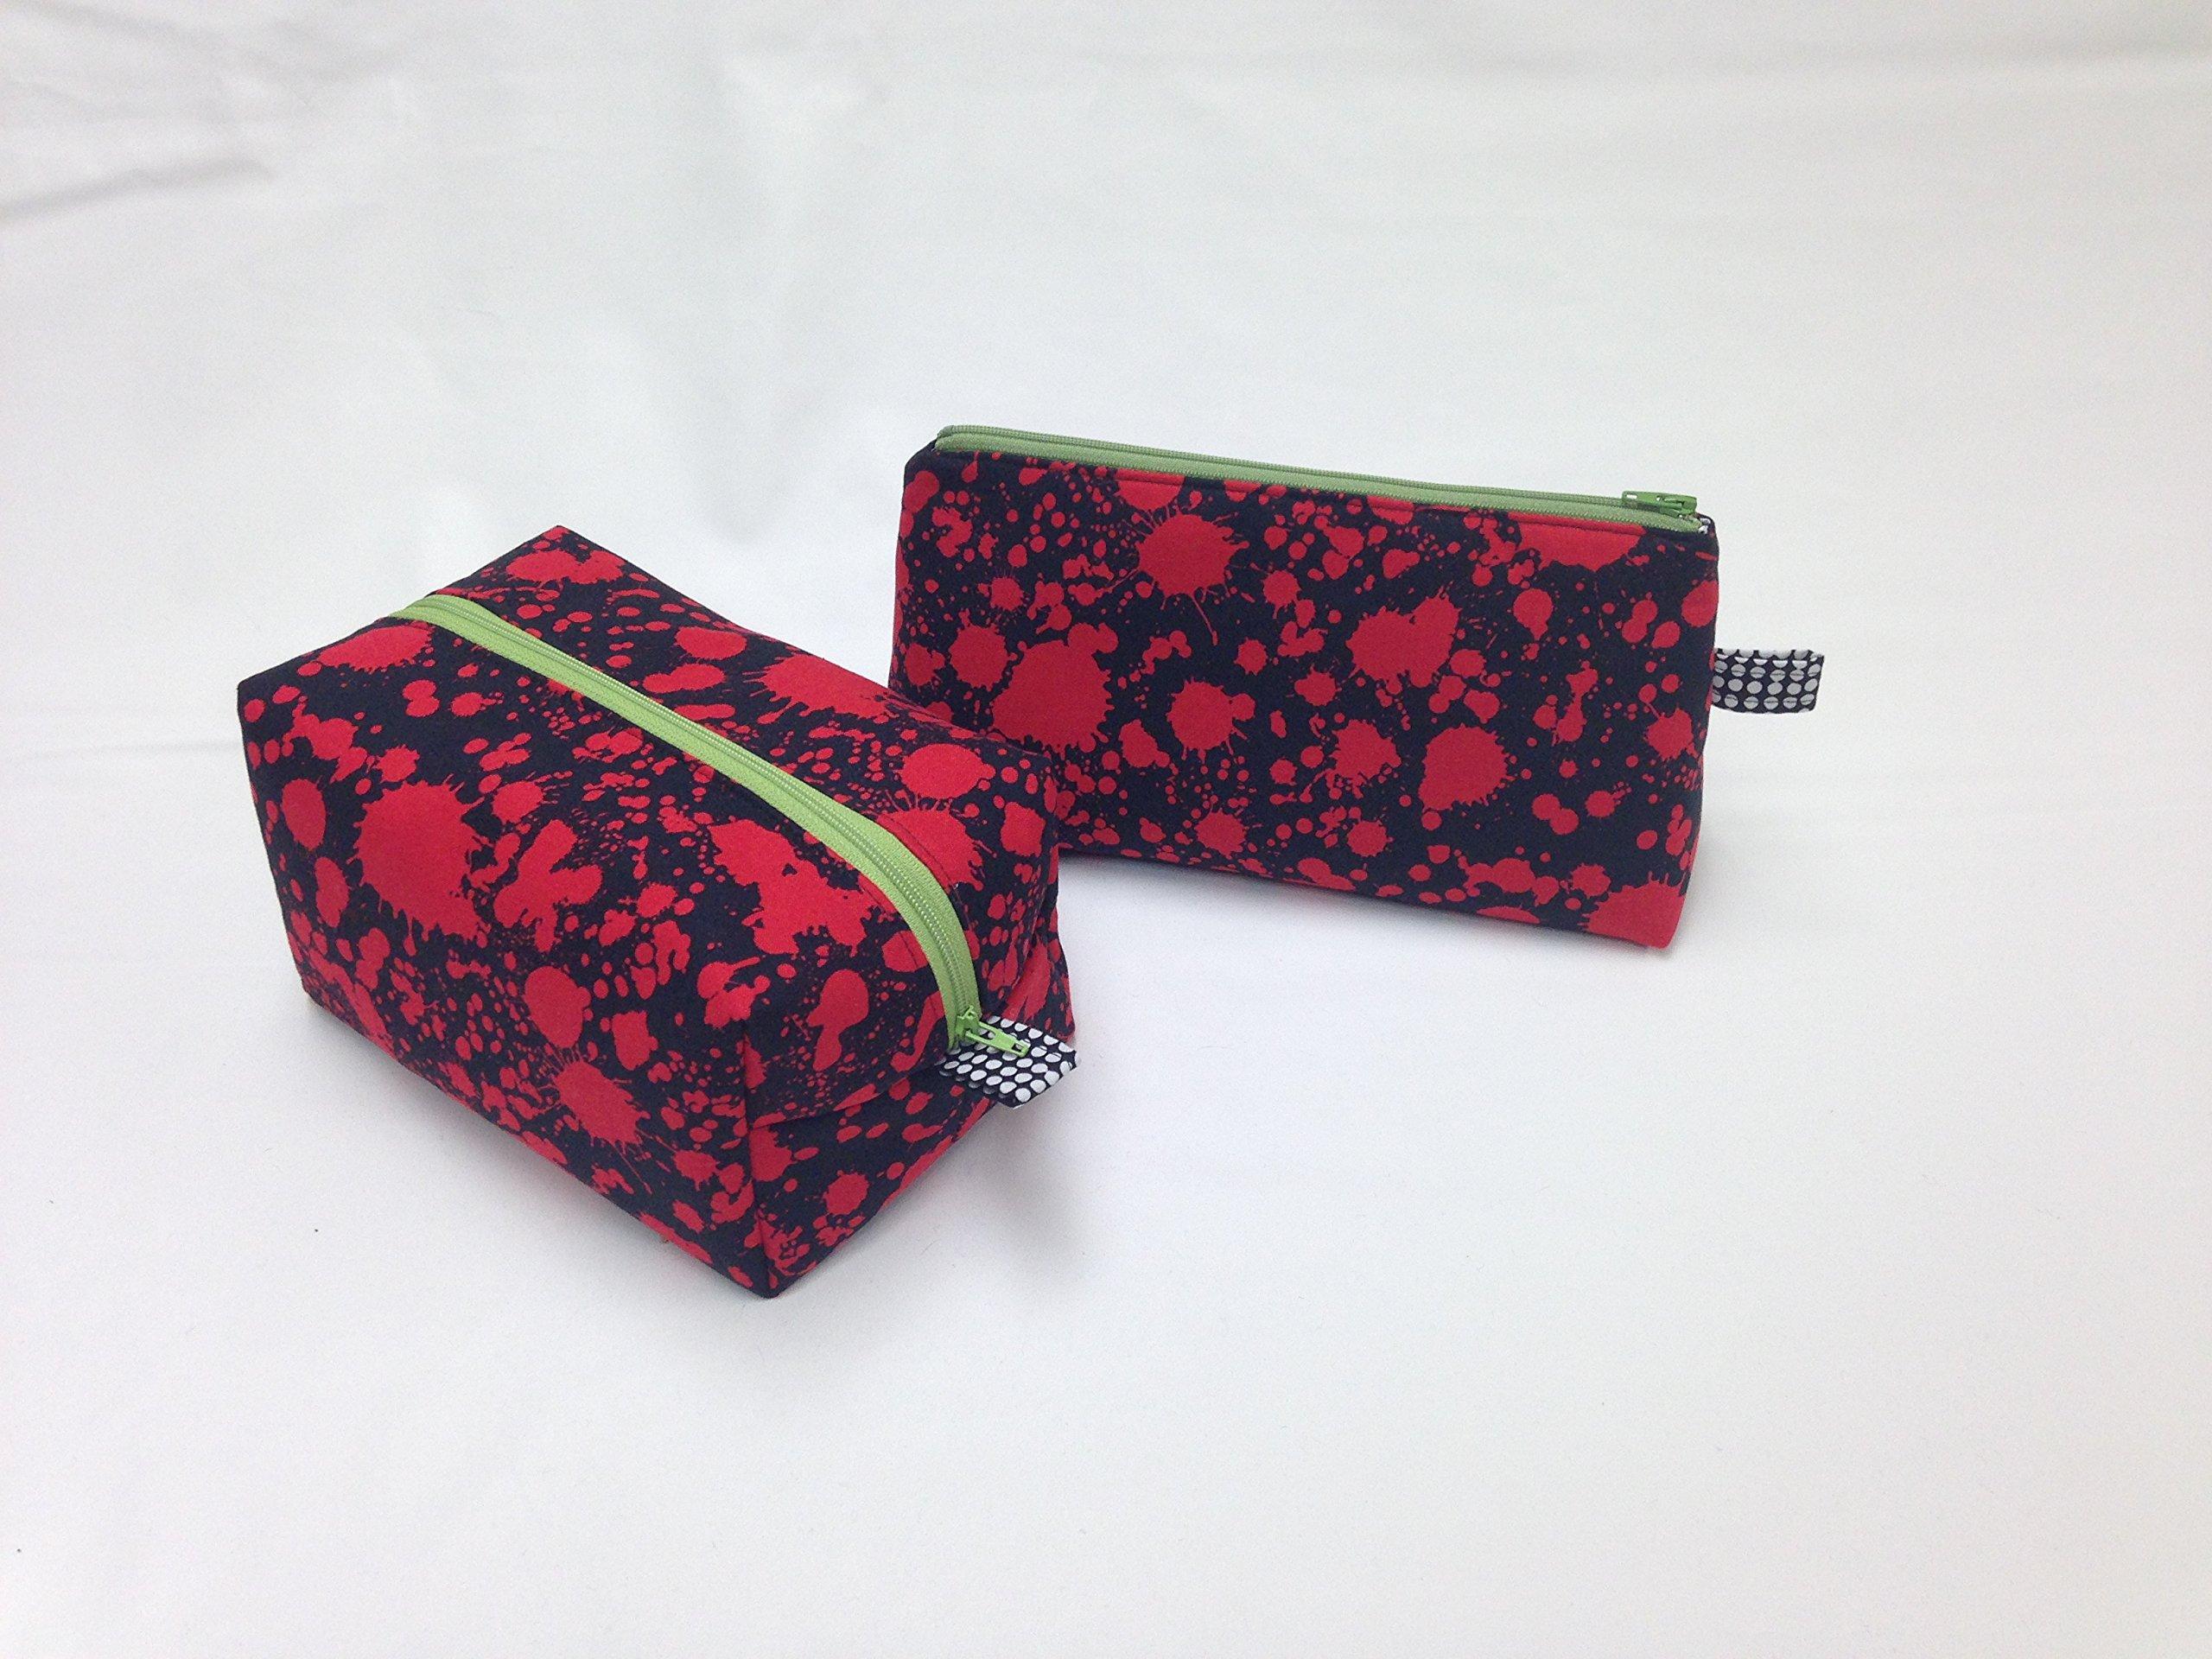 Red & Black Splat! Toiletry/Makeup Bag Set